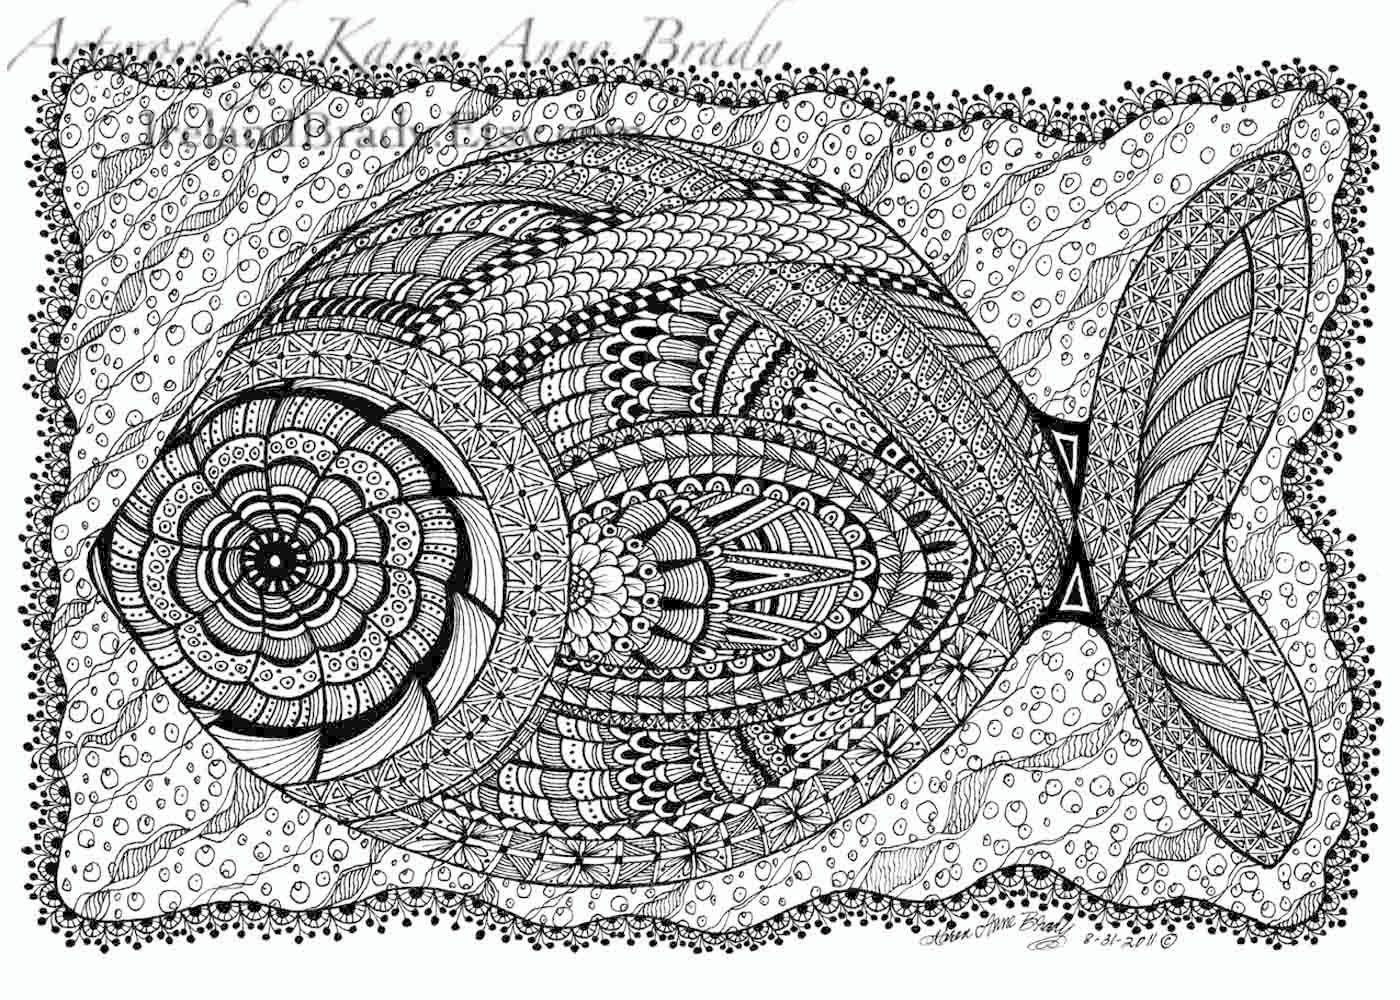 Aceo open edition print rosa 39 s flounder zentangle - Doodle dessin ...